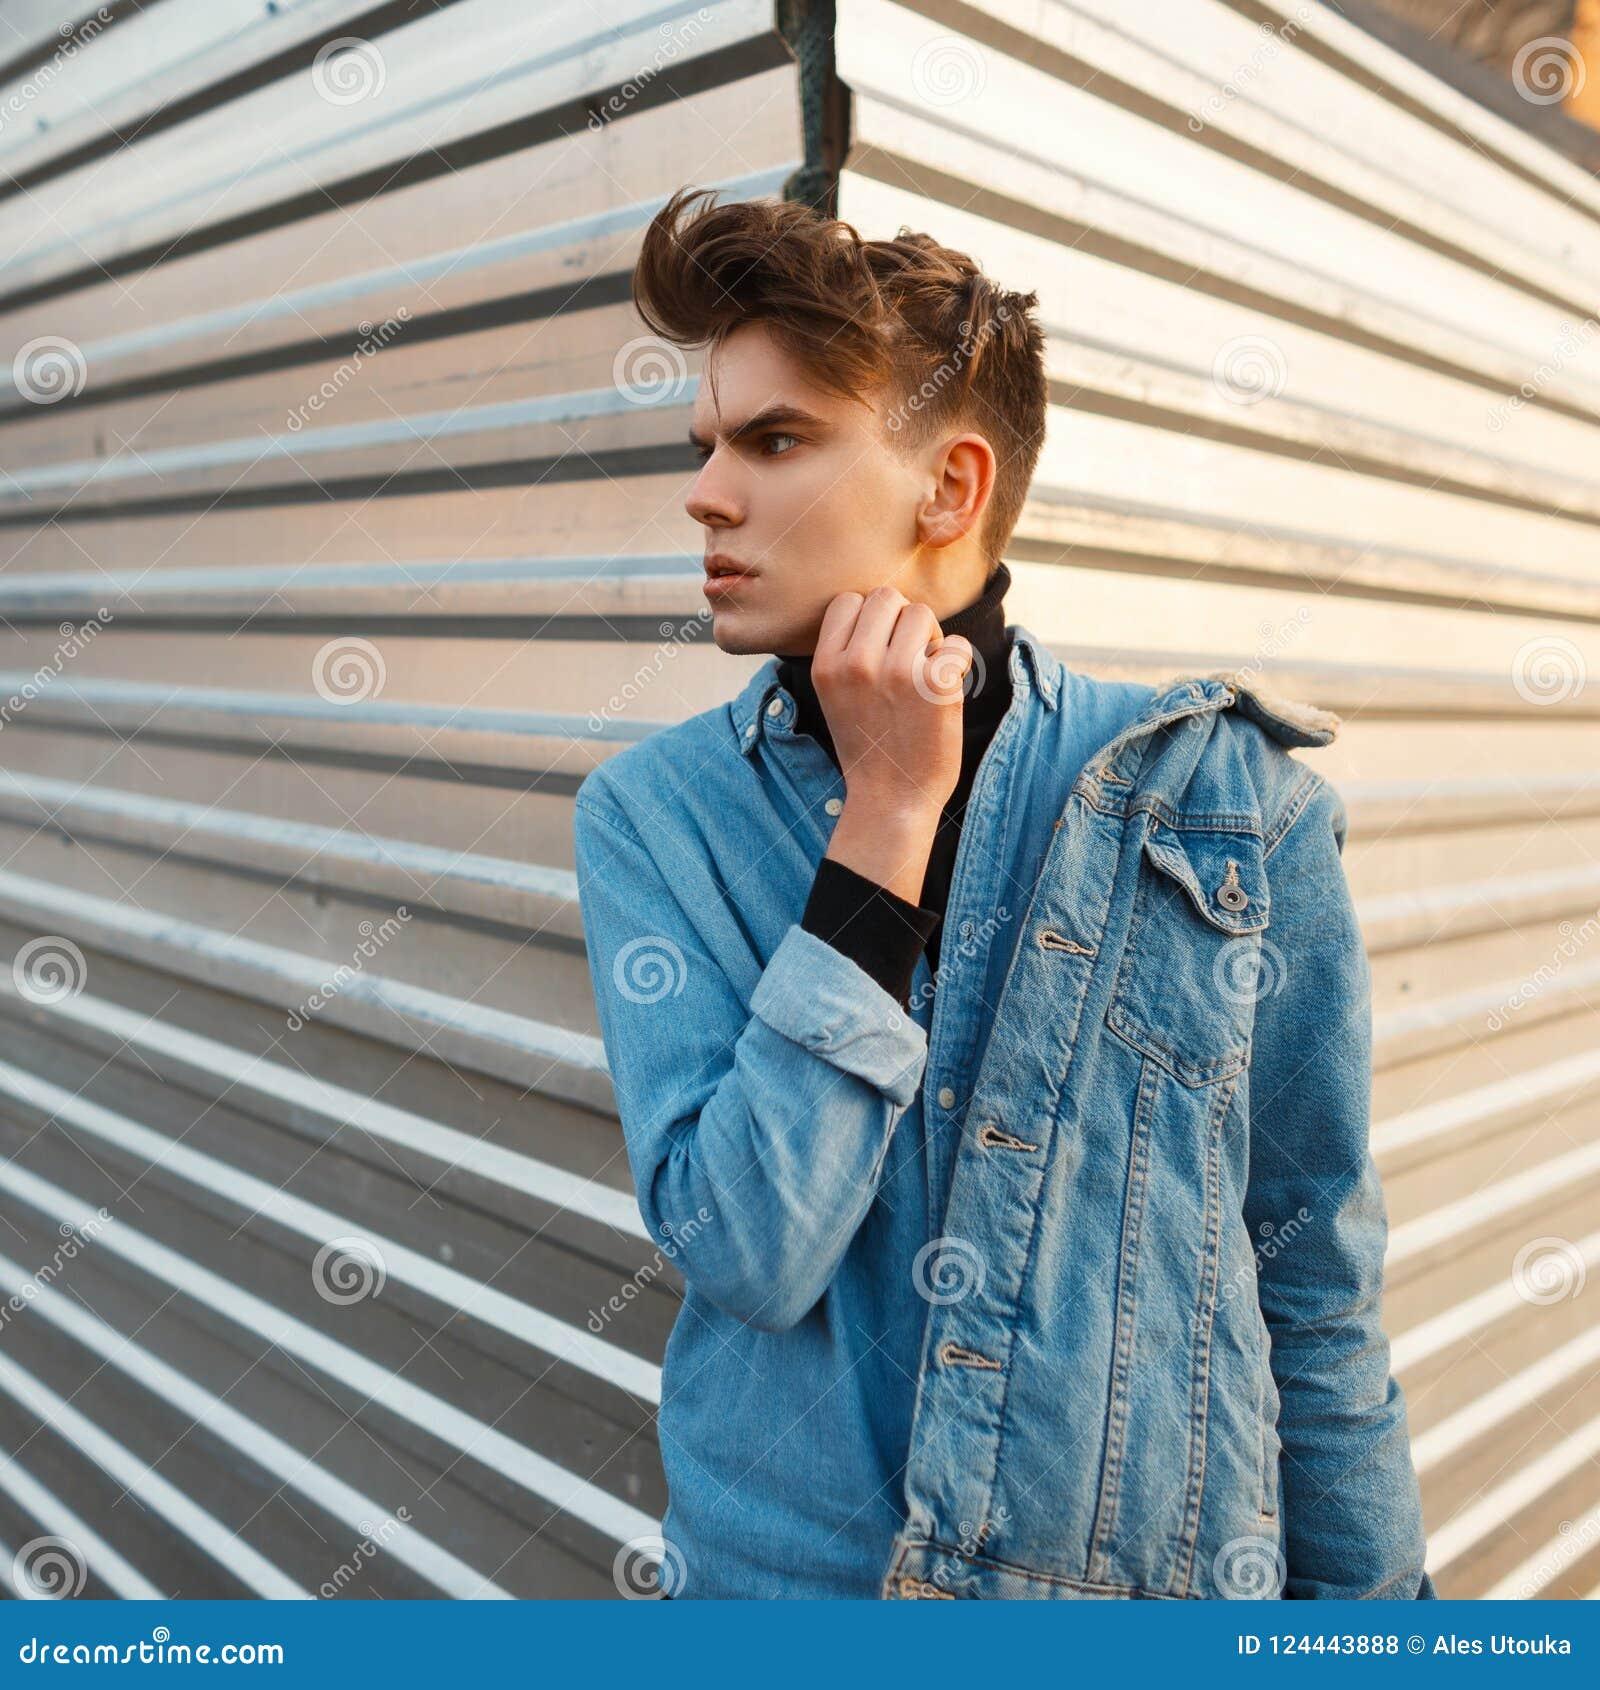 Jean Jacket Black Shirt